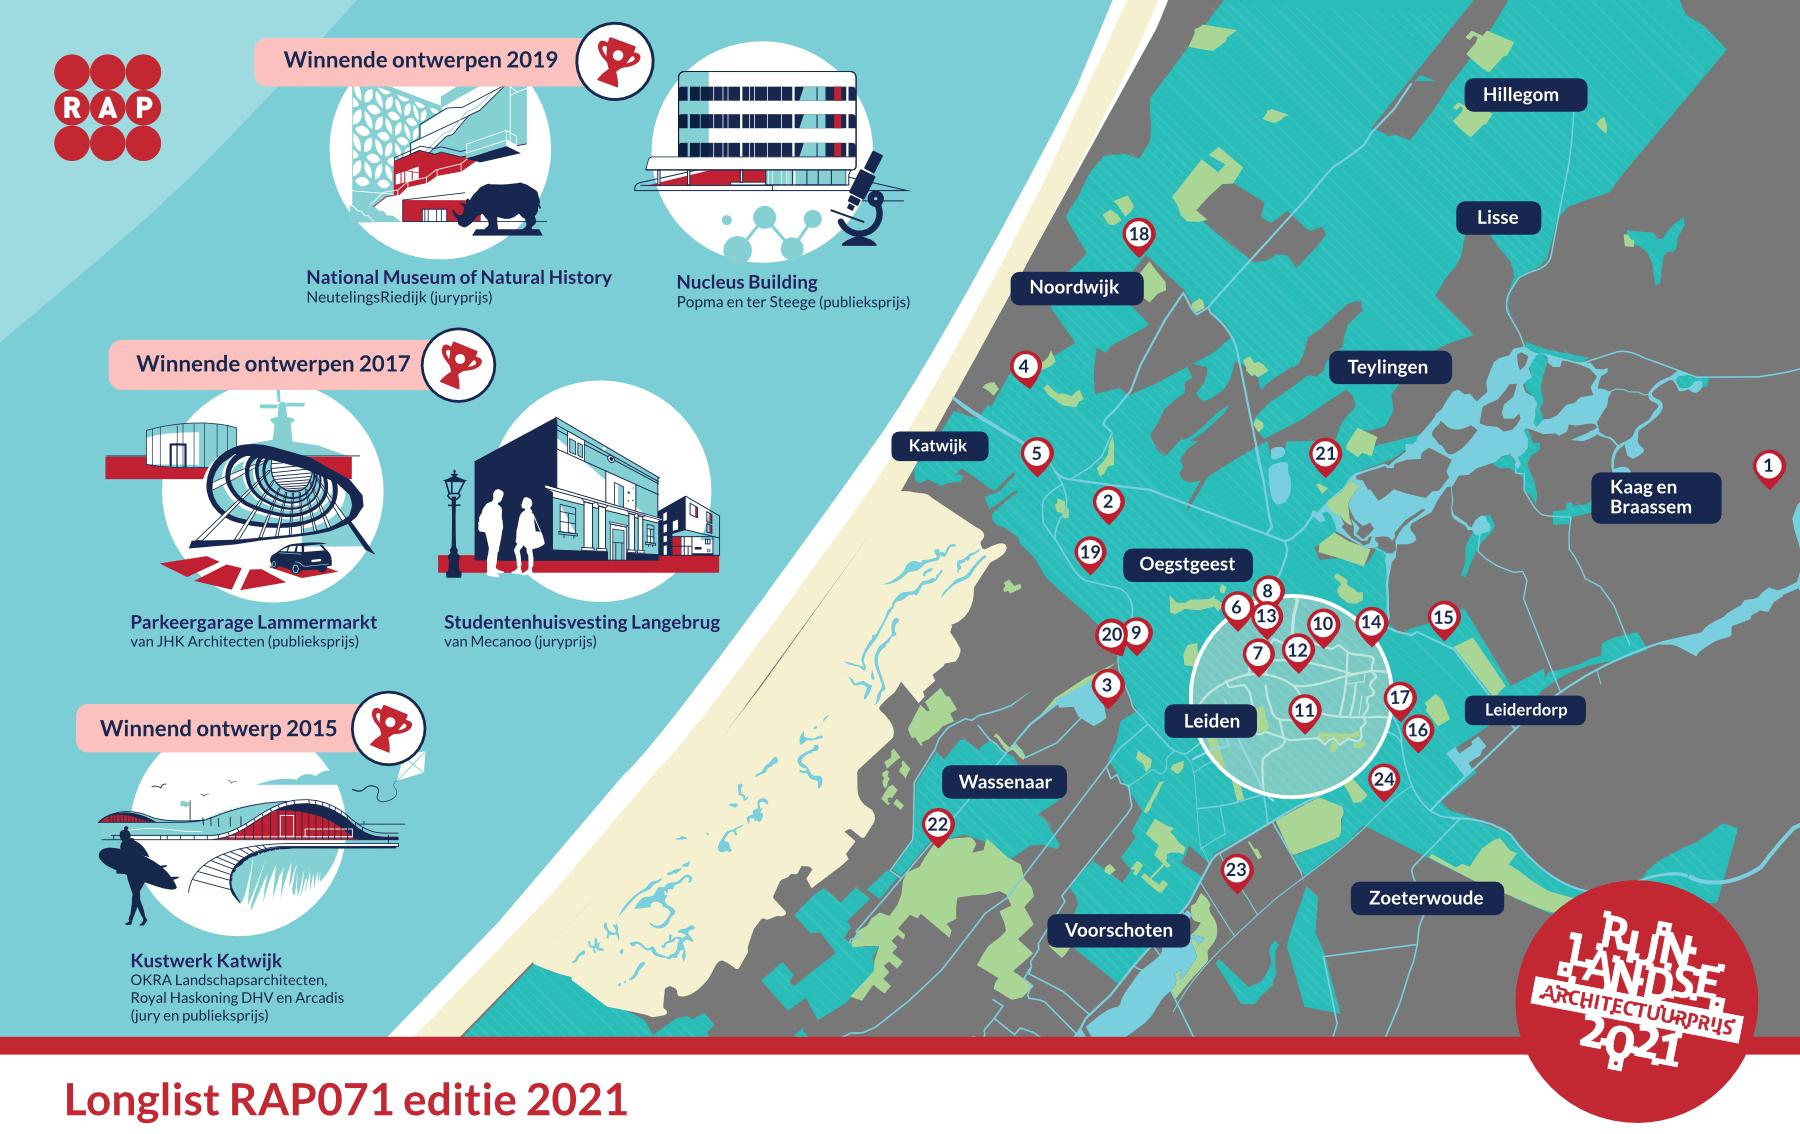 Longlist Rijnlandse Architectuur Prijs 2021 bekend